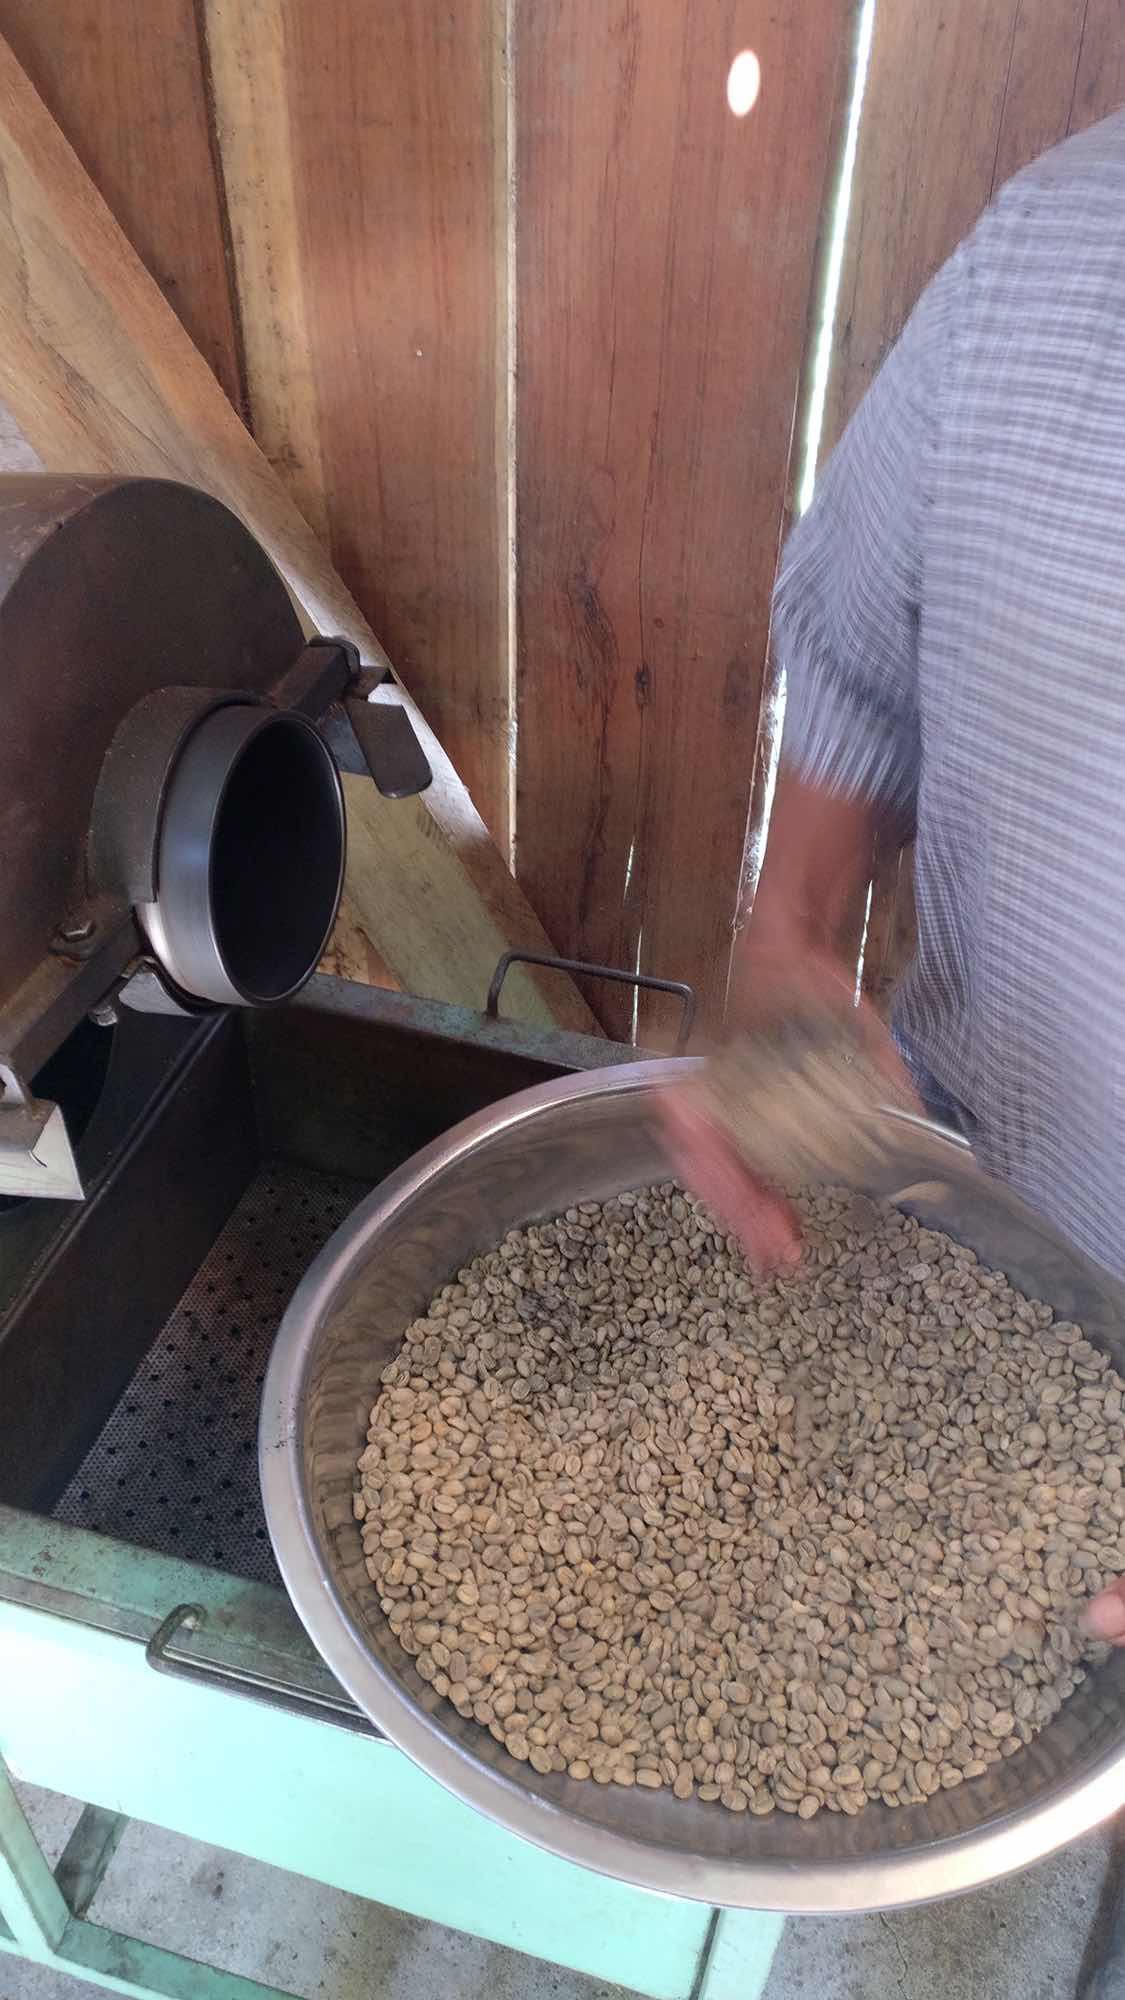 Roasting coffee in Pijao, Colombia